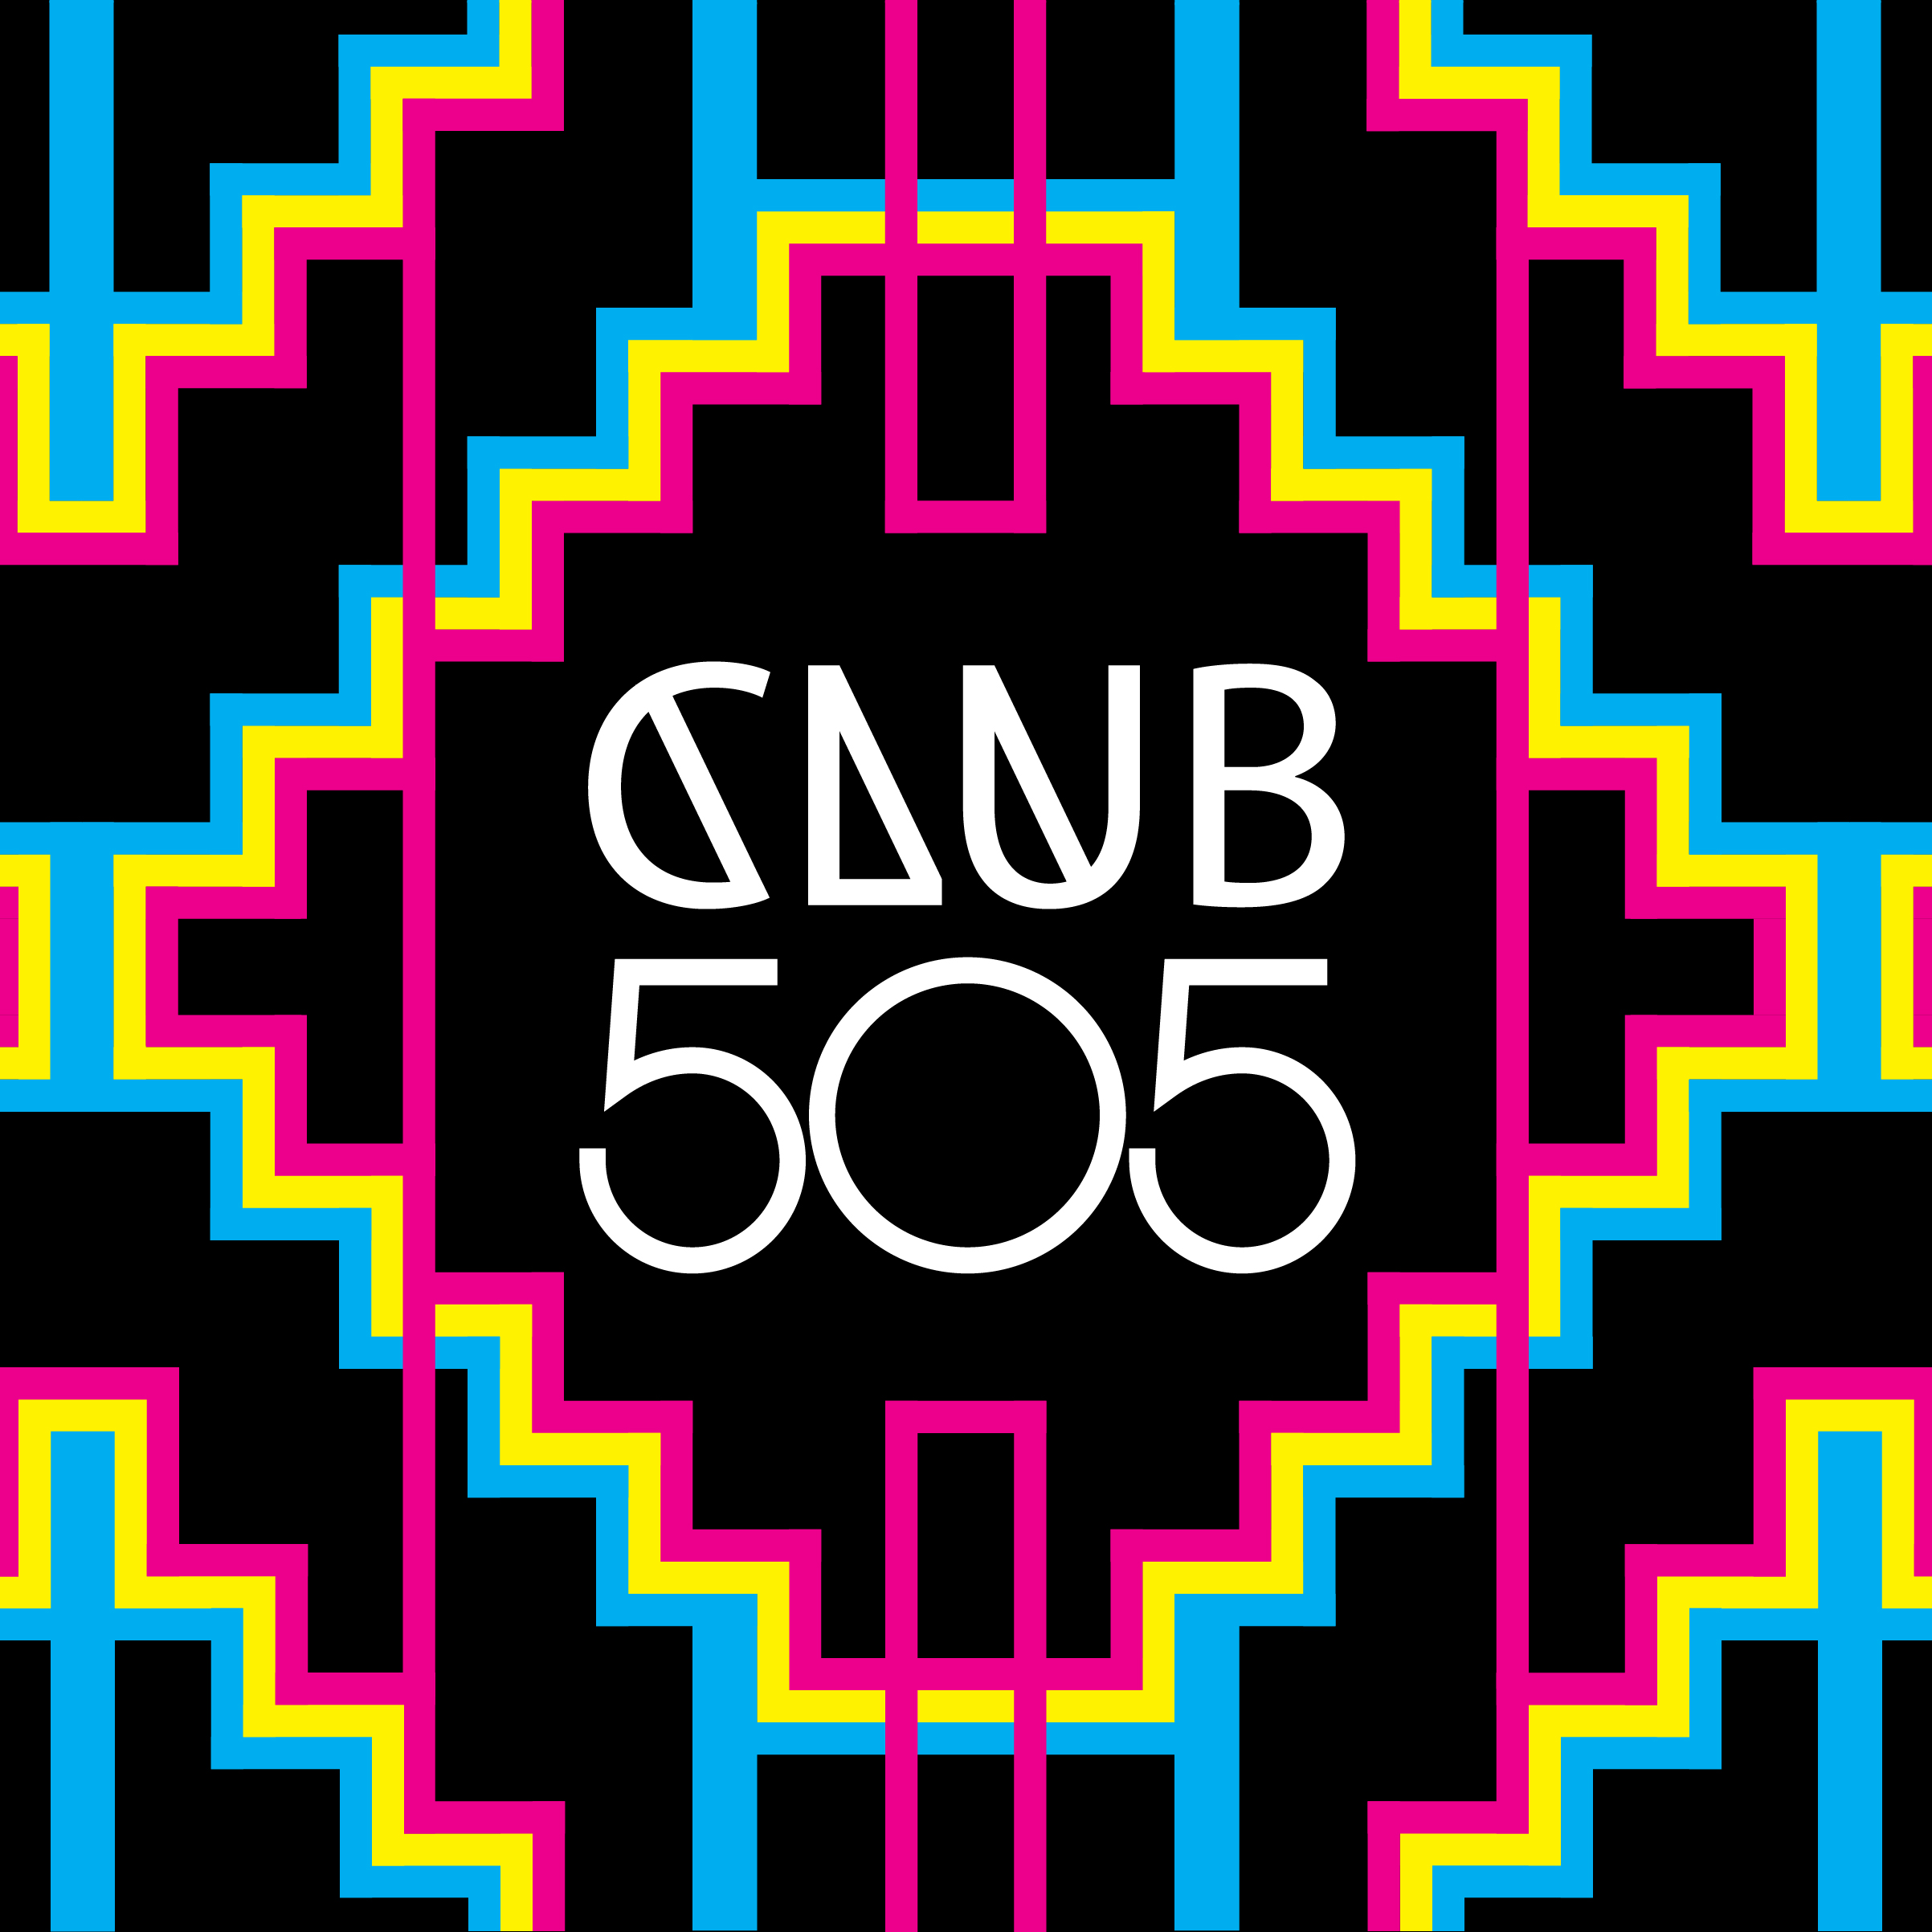 CLUB505